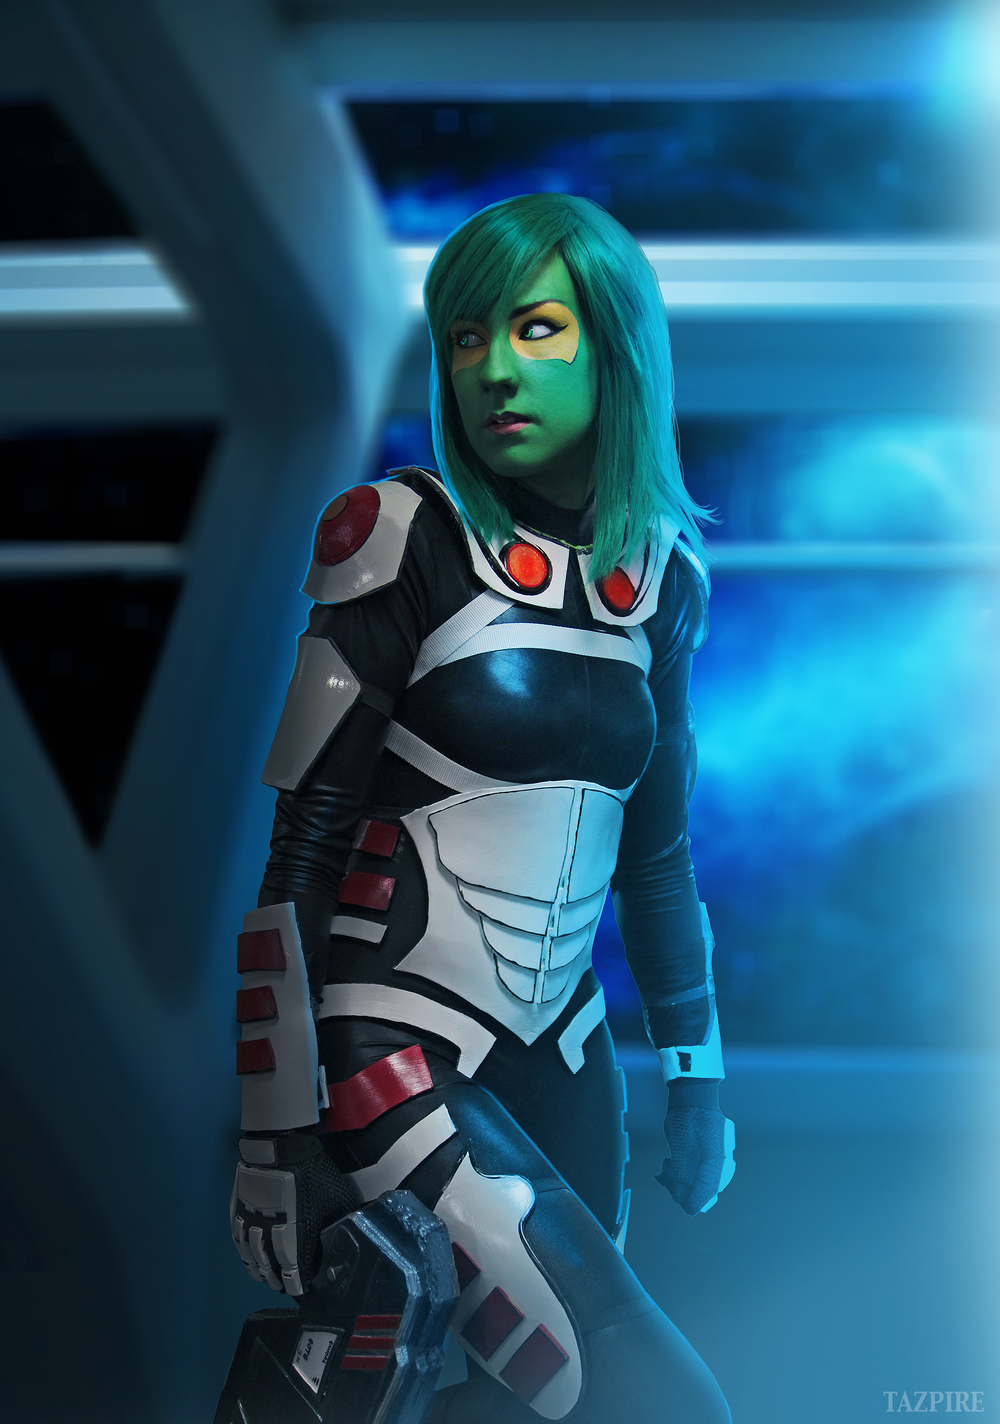 SpiderCam Cosplay is Gamora | Photo by: CamraKaze